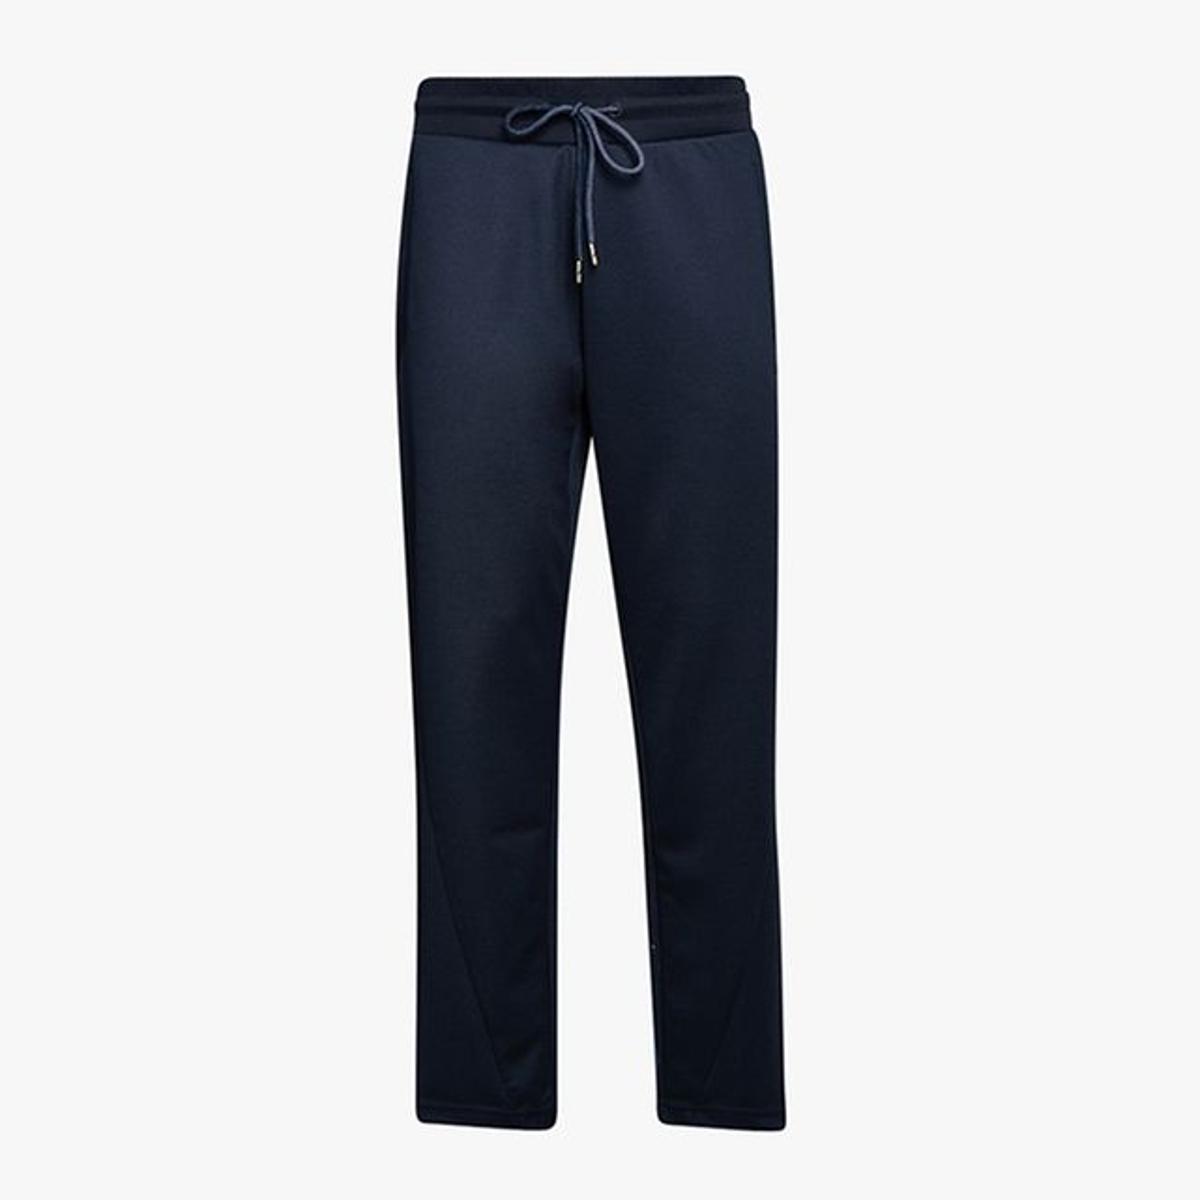 Pantalon TRACK 5PALLE